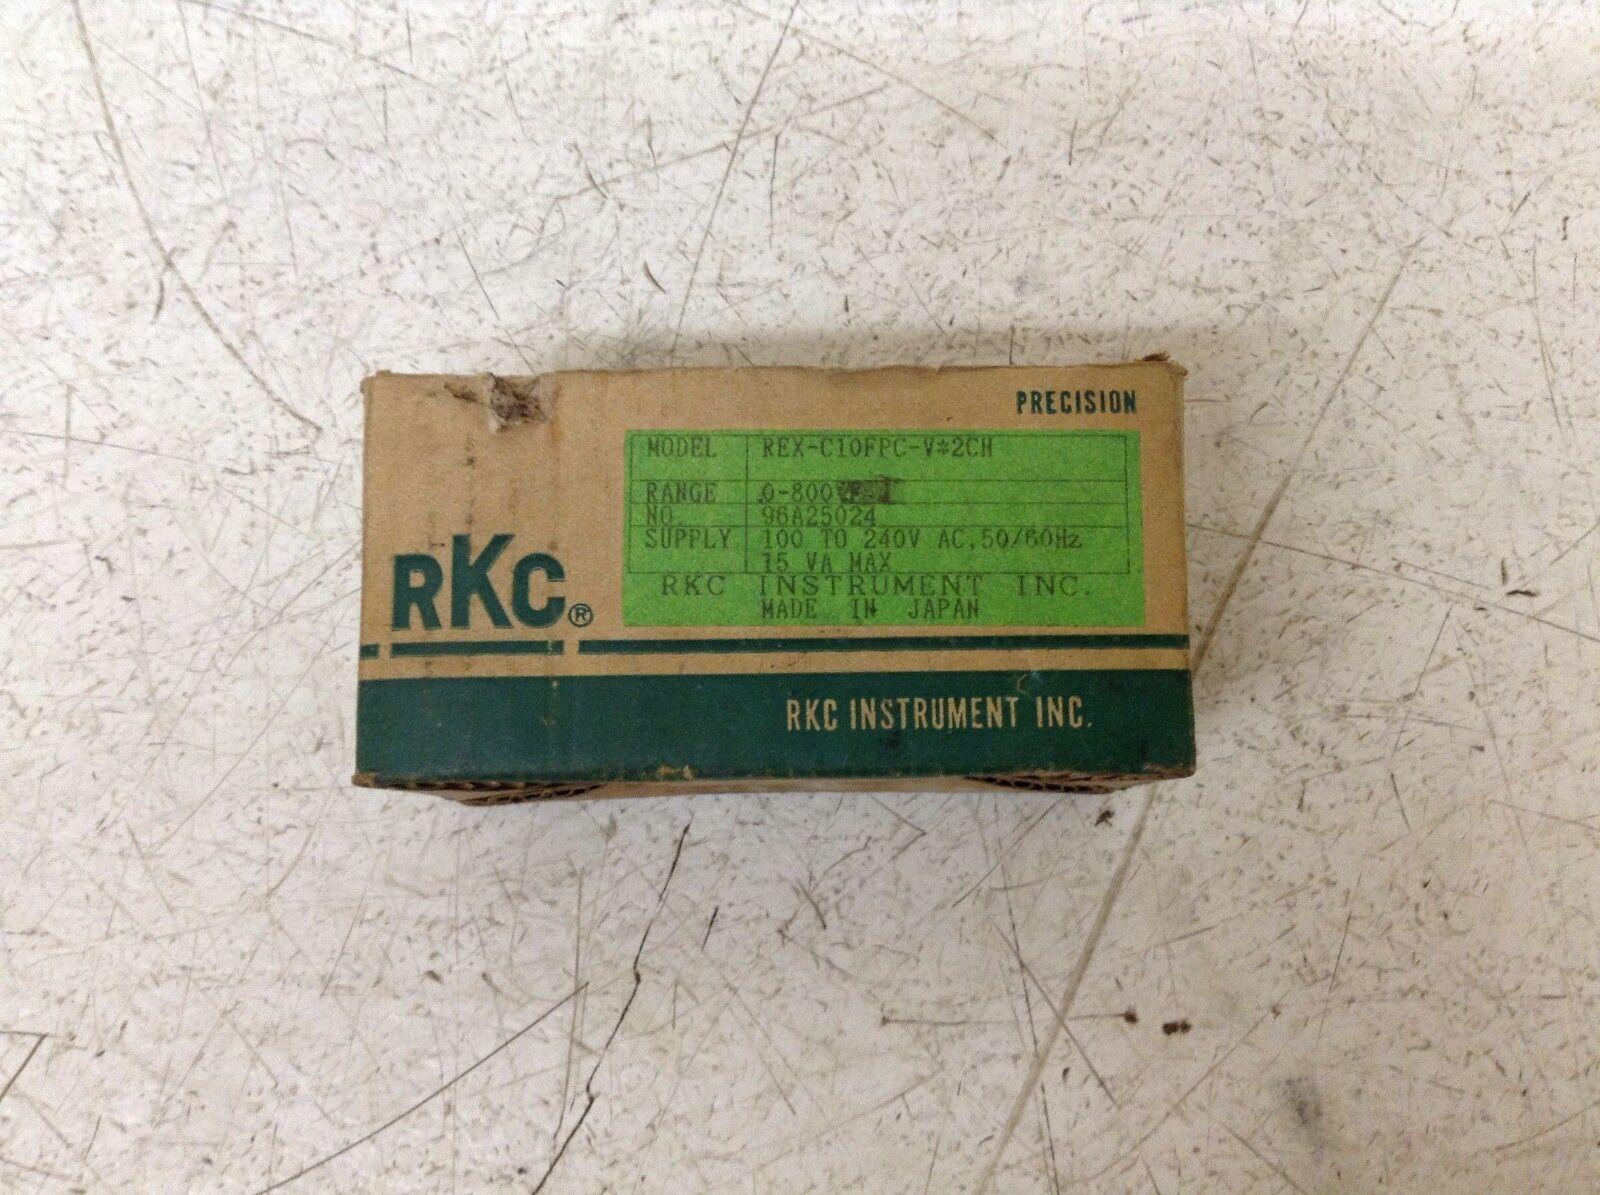 RKC REX-C10FPC-V2CH Regulador V de Temperatura 100-240 V Regulador REX-C10FPC-V 2CH Nuevo fdefd5